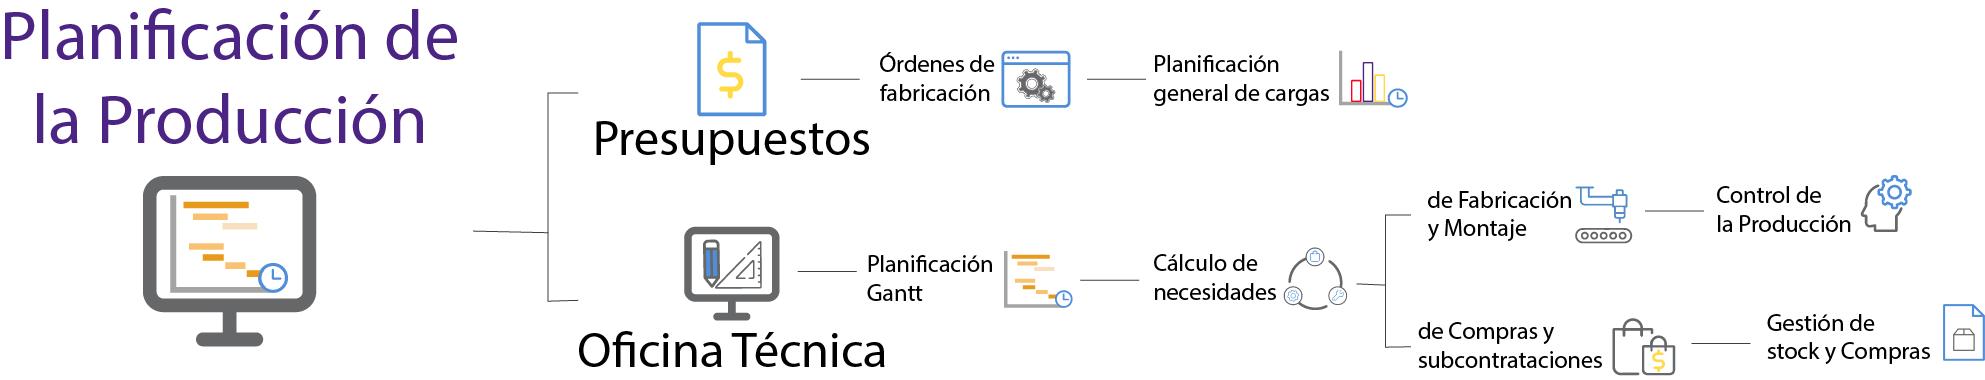 organigrama planificacion